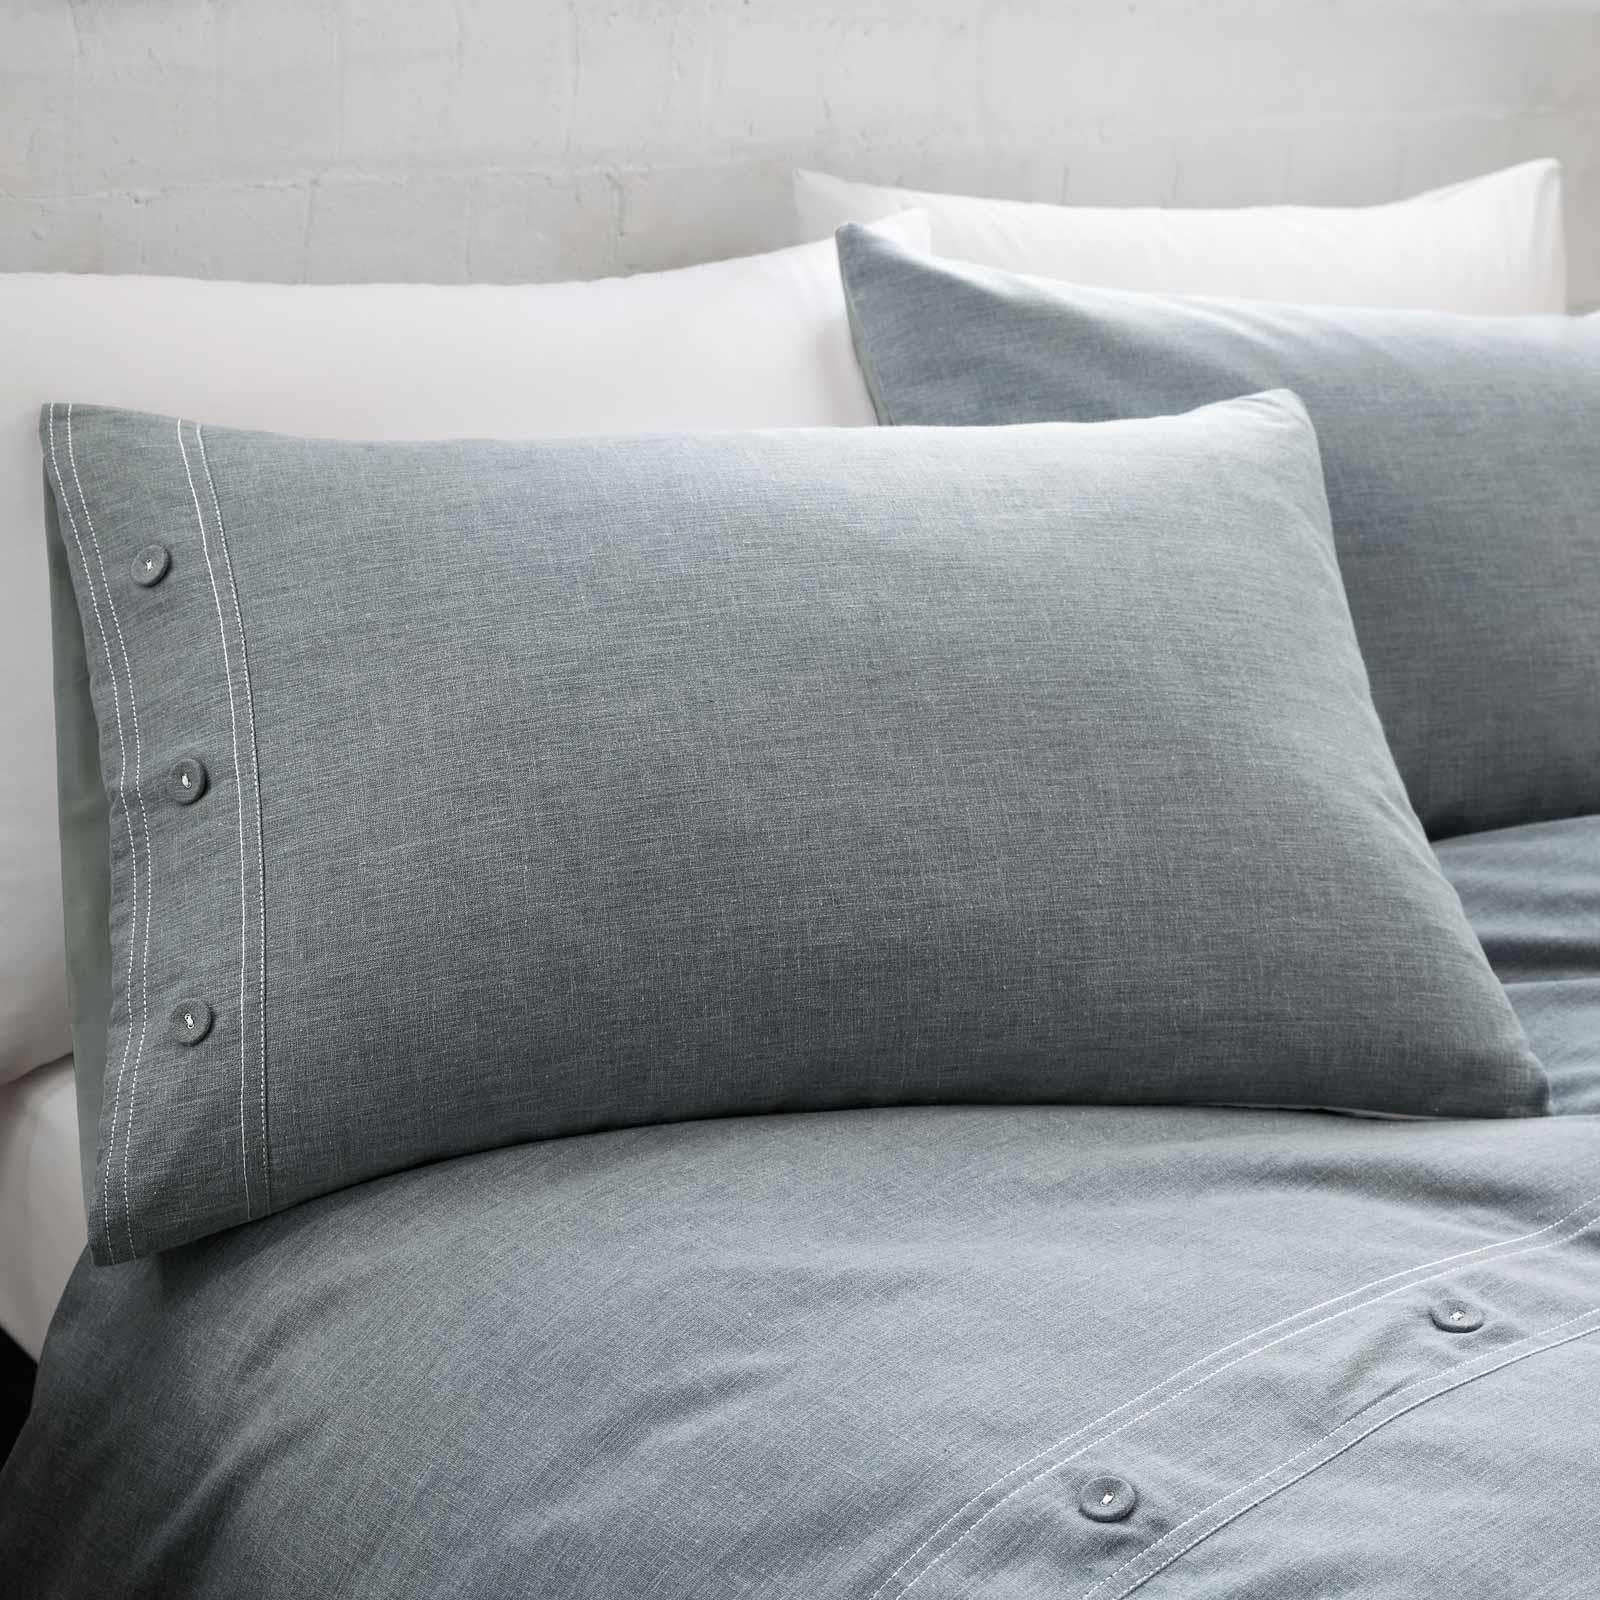 Azul-fundas-nordicas-Denim-Chambray-Boton-Detalle-de-lujo-cubierta-del-edredon-conjuntos-de-cama miniatura 16